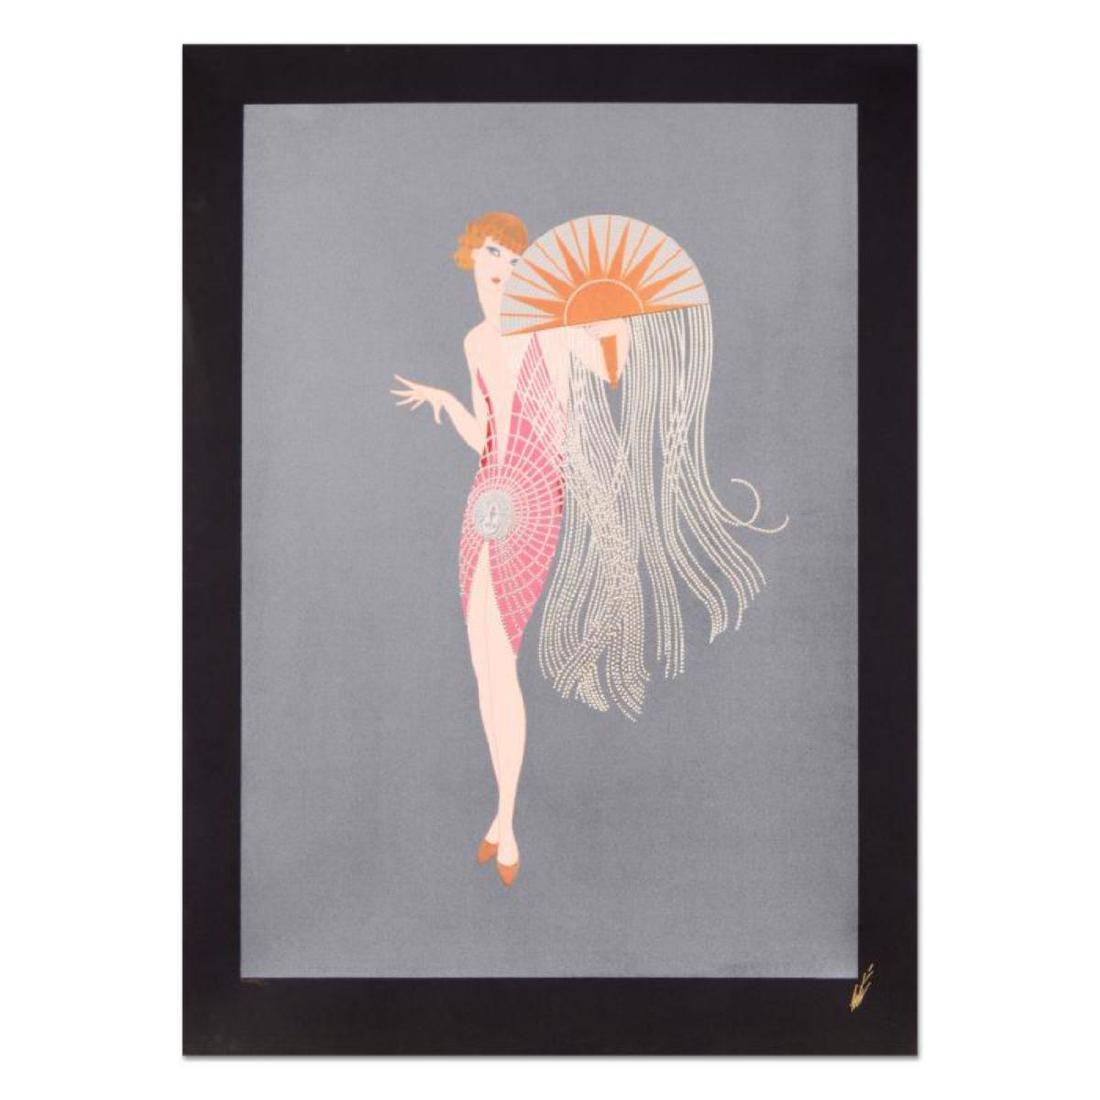 "Erte (1892-1990), ""Flapper"" Limited Edition Serigraph,"